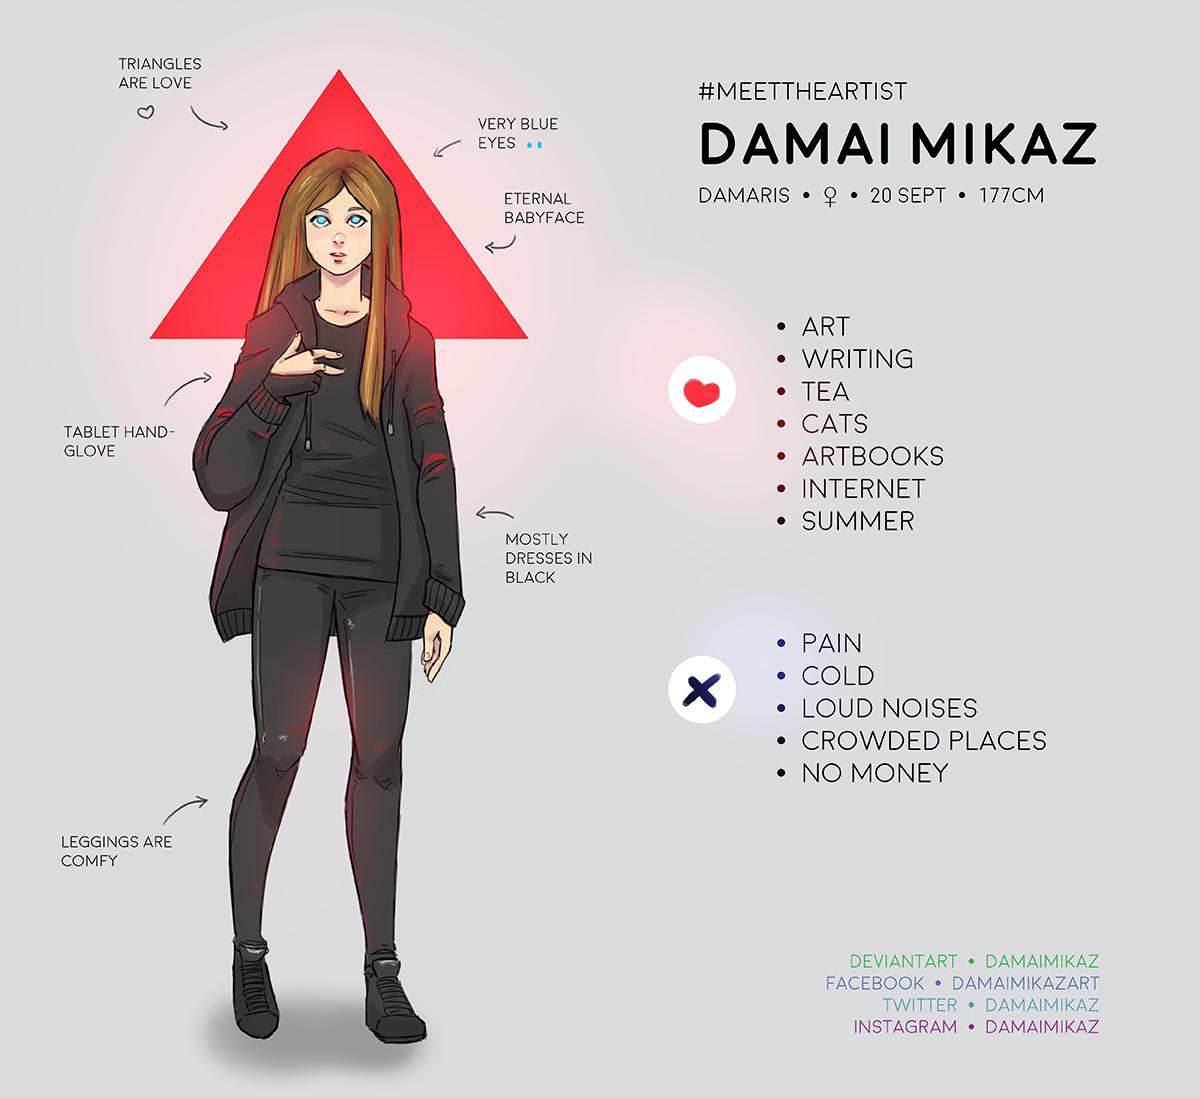 DamaiMikaz's Profile Picture